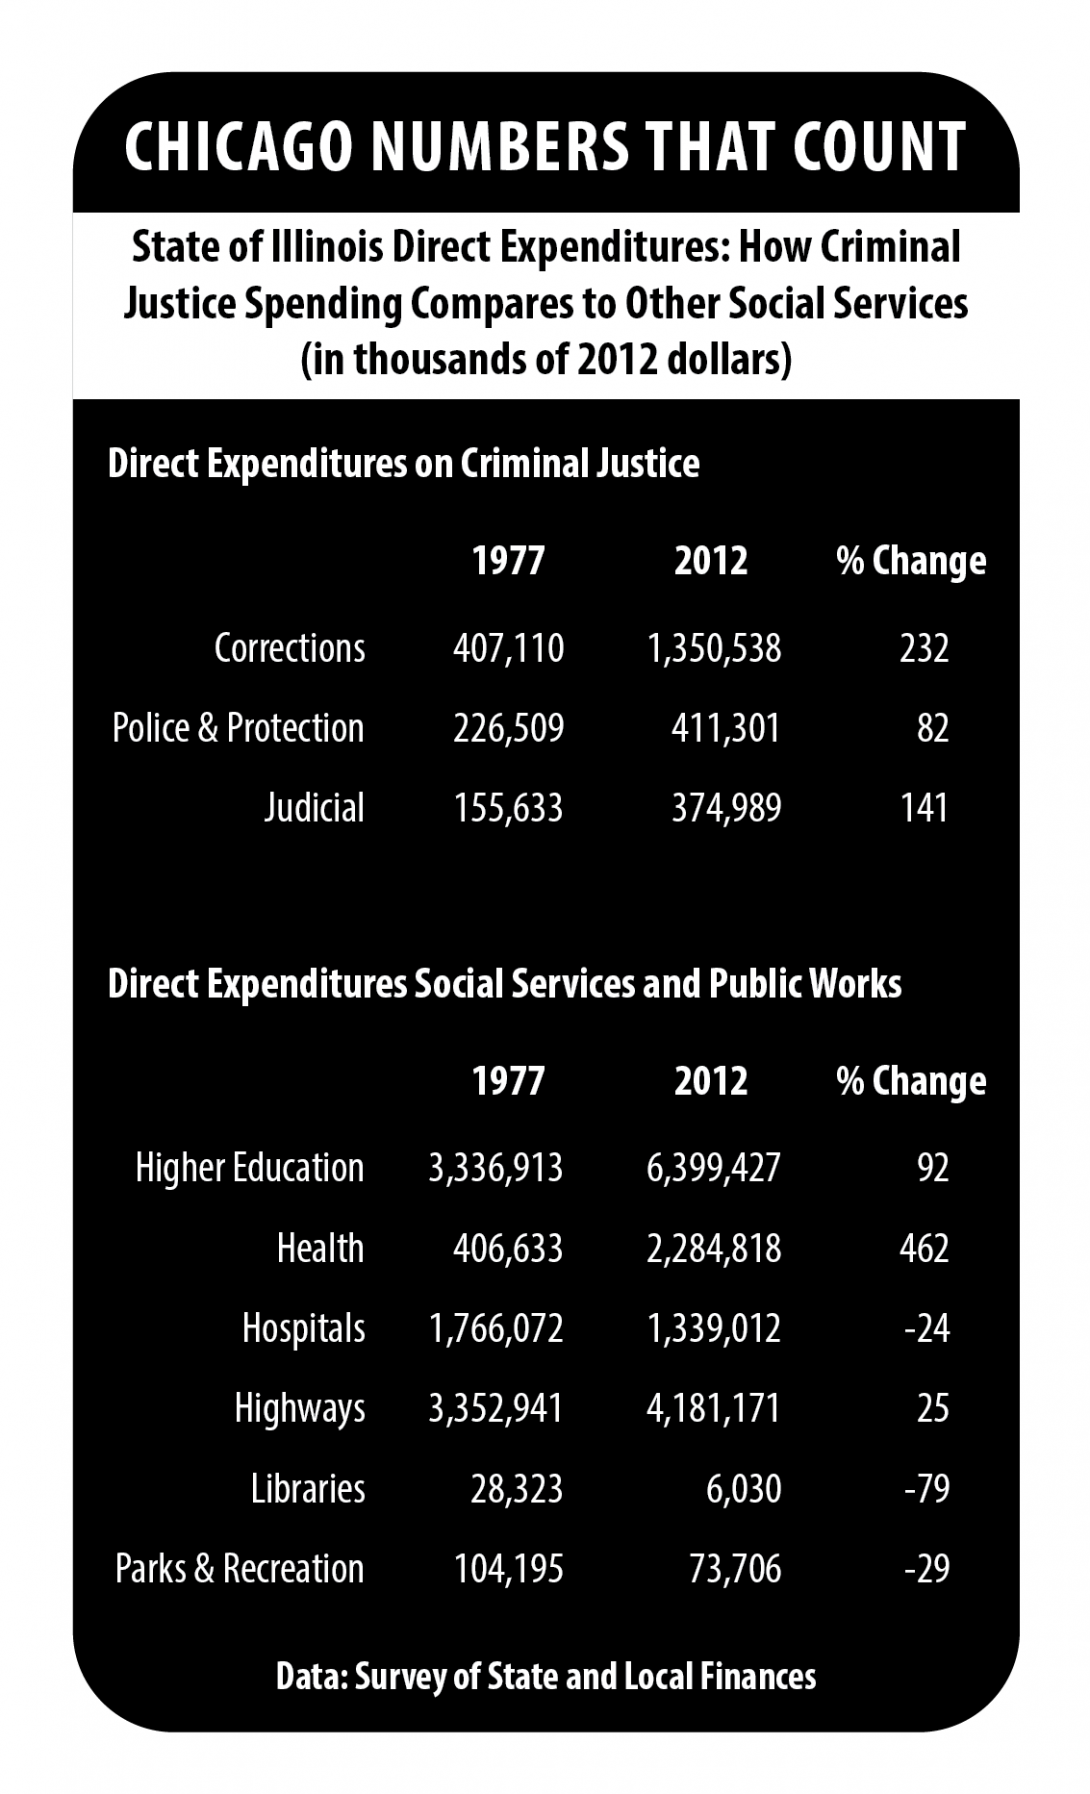 IRRPP Chart On Criminal Justice Spending